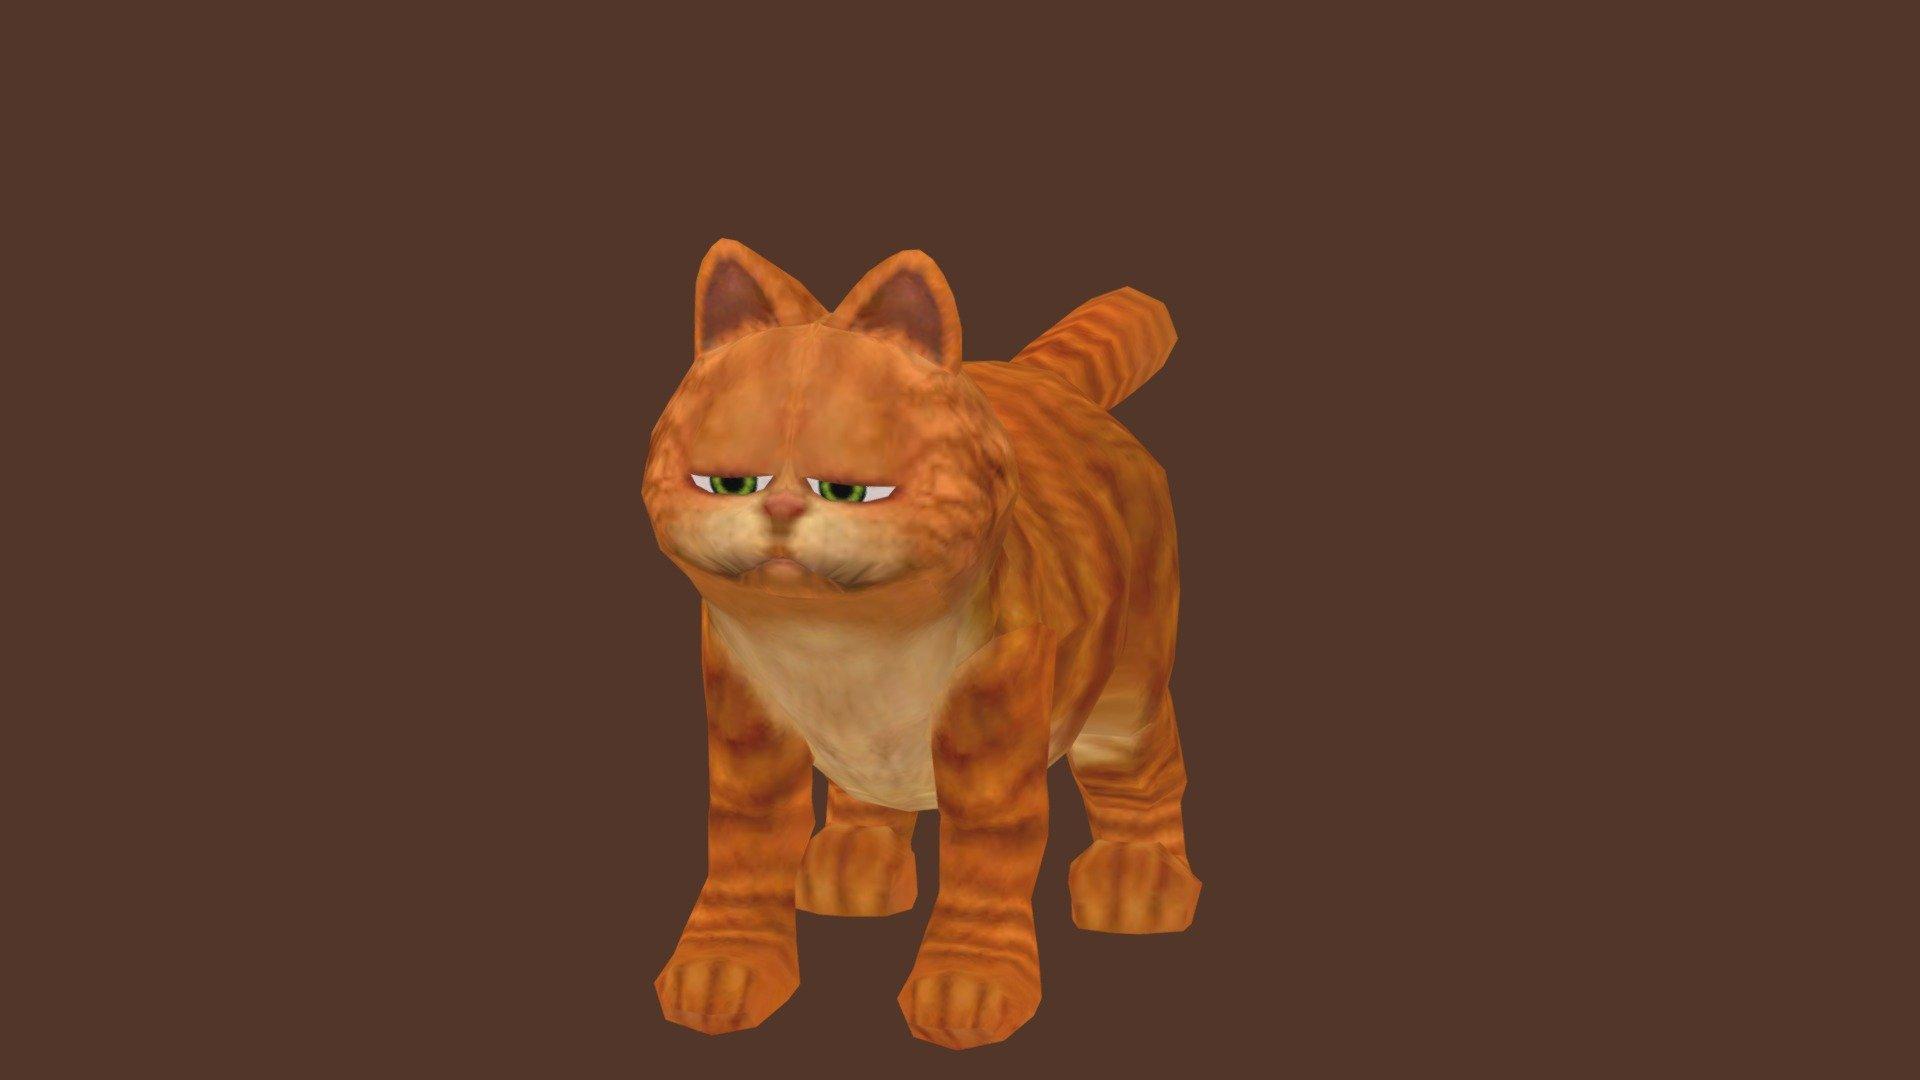 Garfield Download Free 3d Model By Funnyspoonman Funnyspoonman 69e7920 Sketchfab